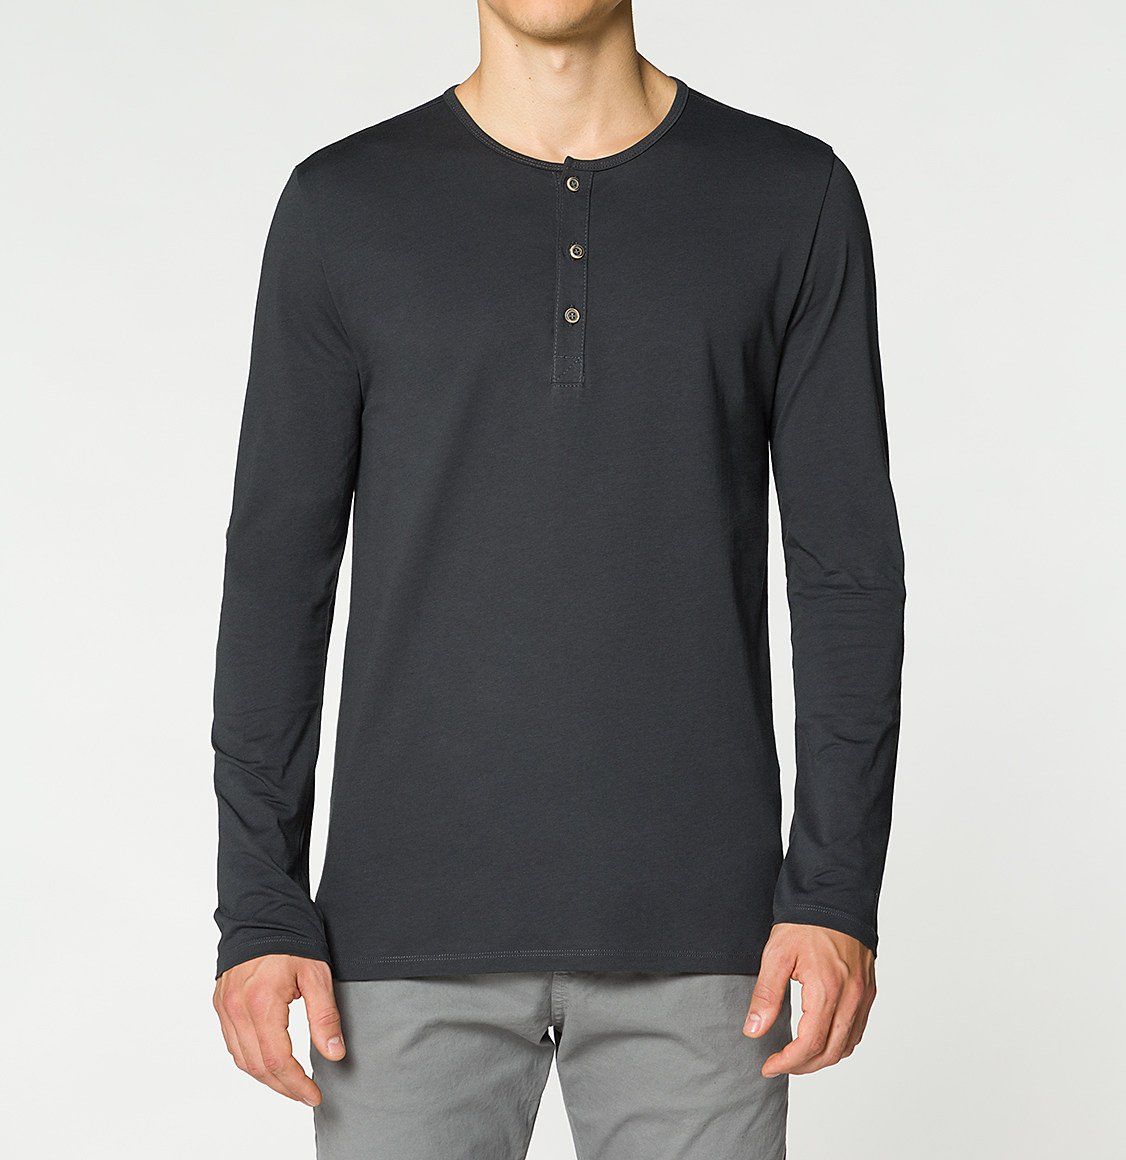 The Project Garments Henley Organic Cotton Long Sleeve T-shirt Asphalt Grey